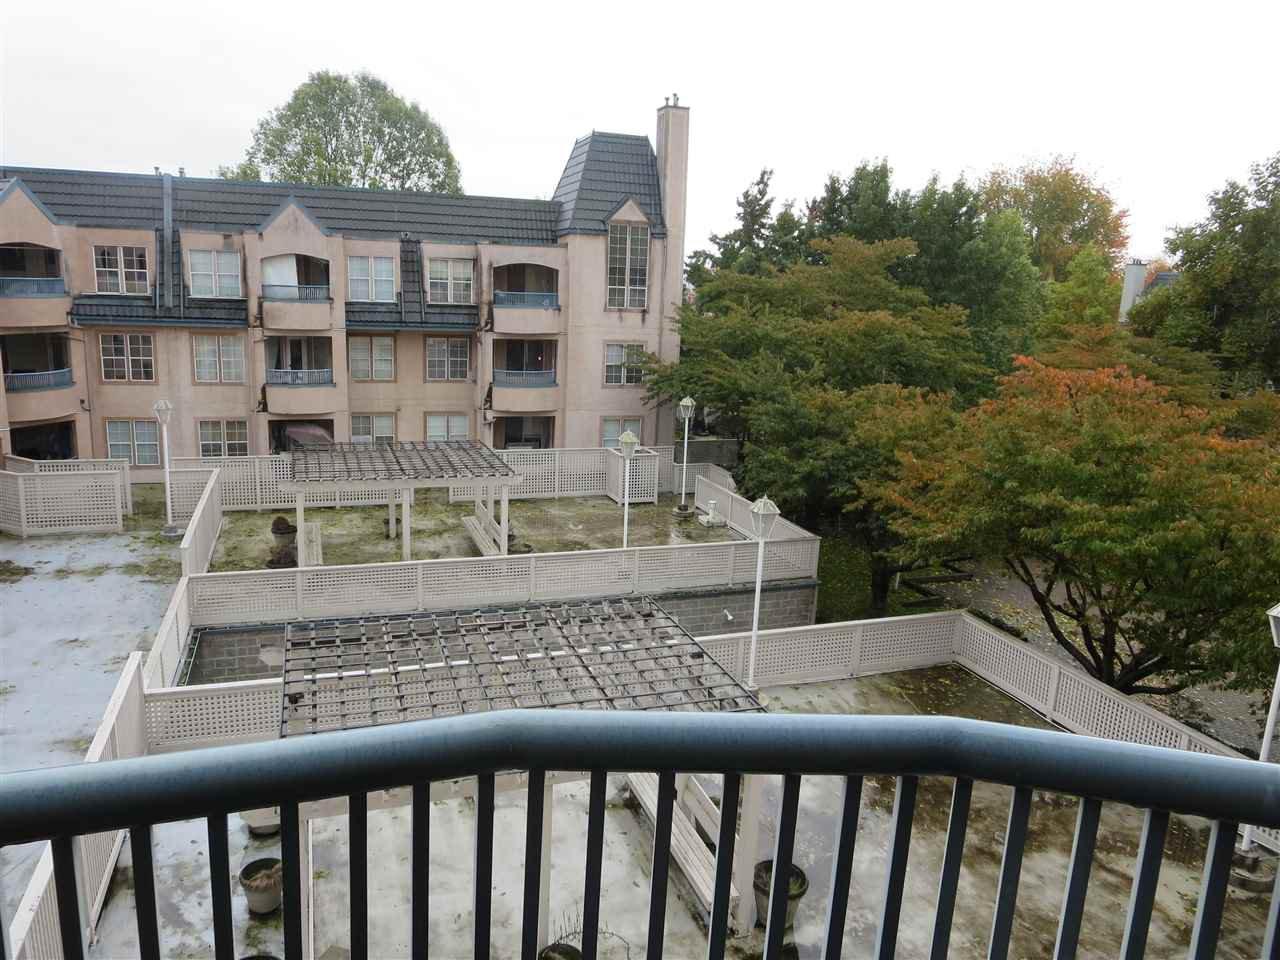 Photo 9: Photos: 317 98 LAVAL Street in Coquitlam: Maillardville Condo for sale : MLS®# R2117700